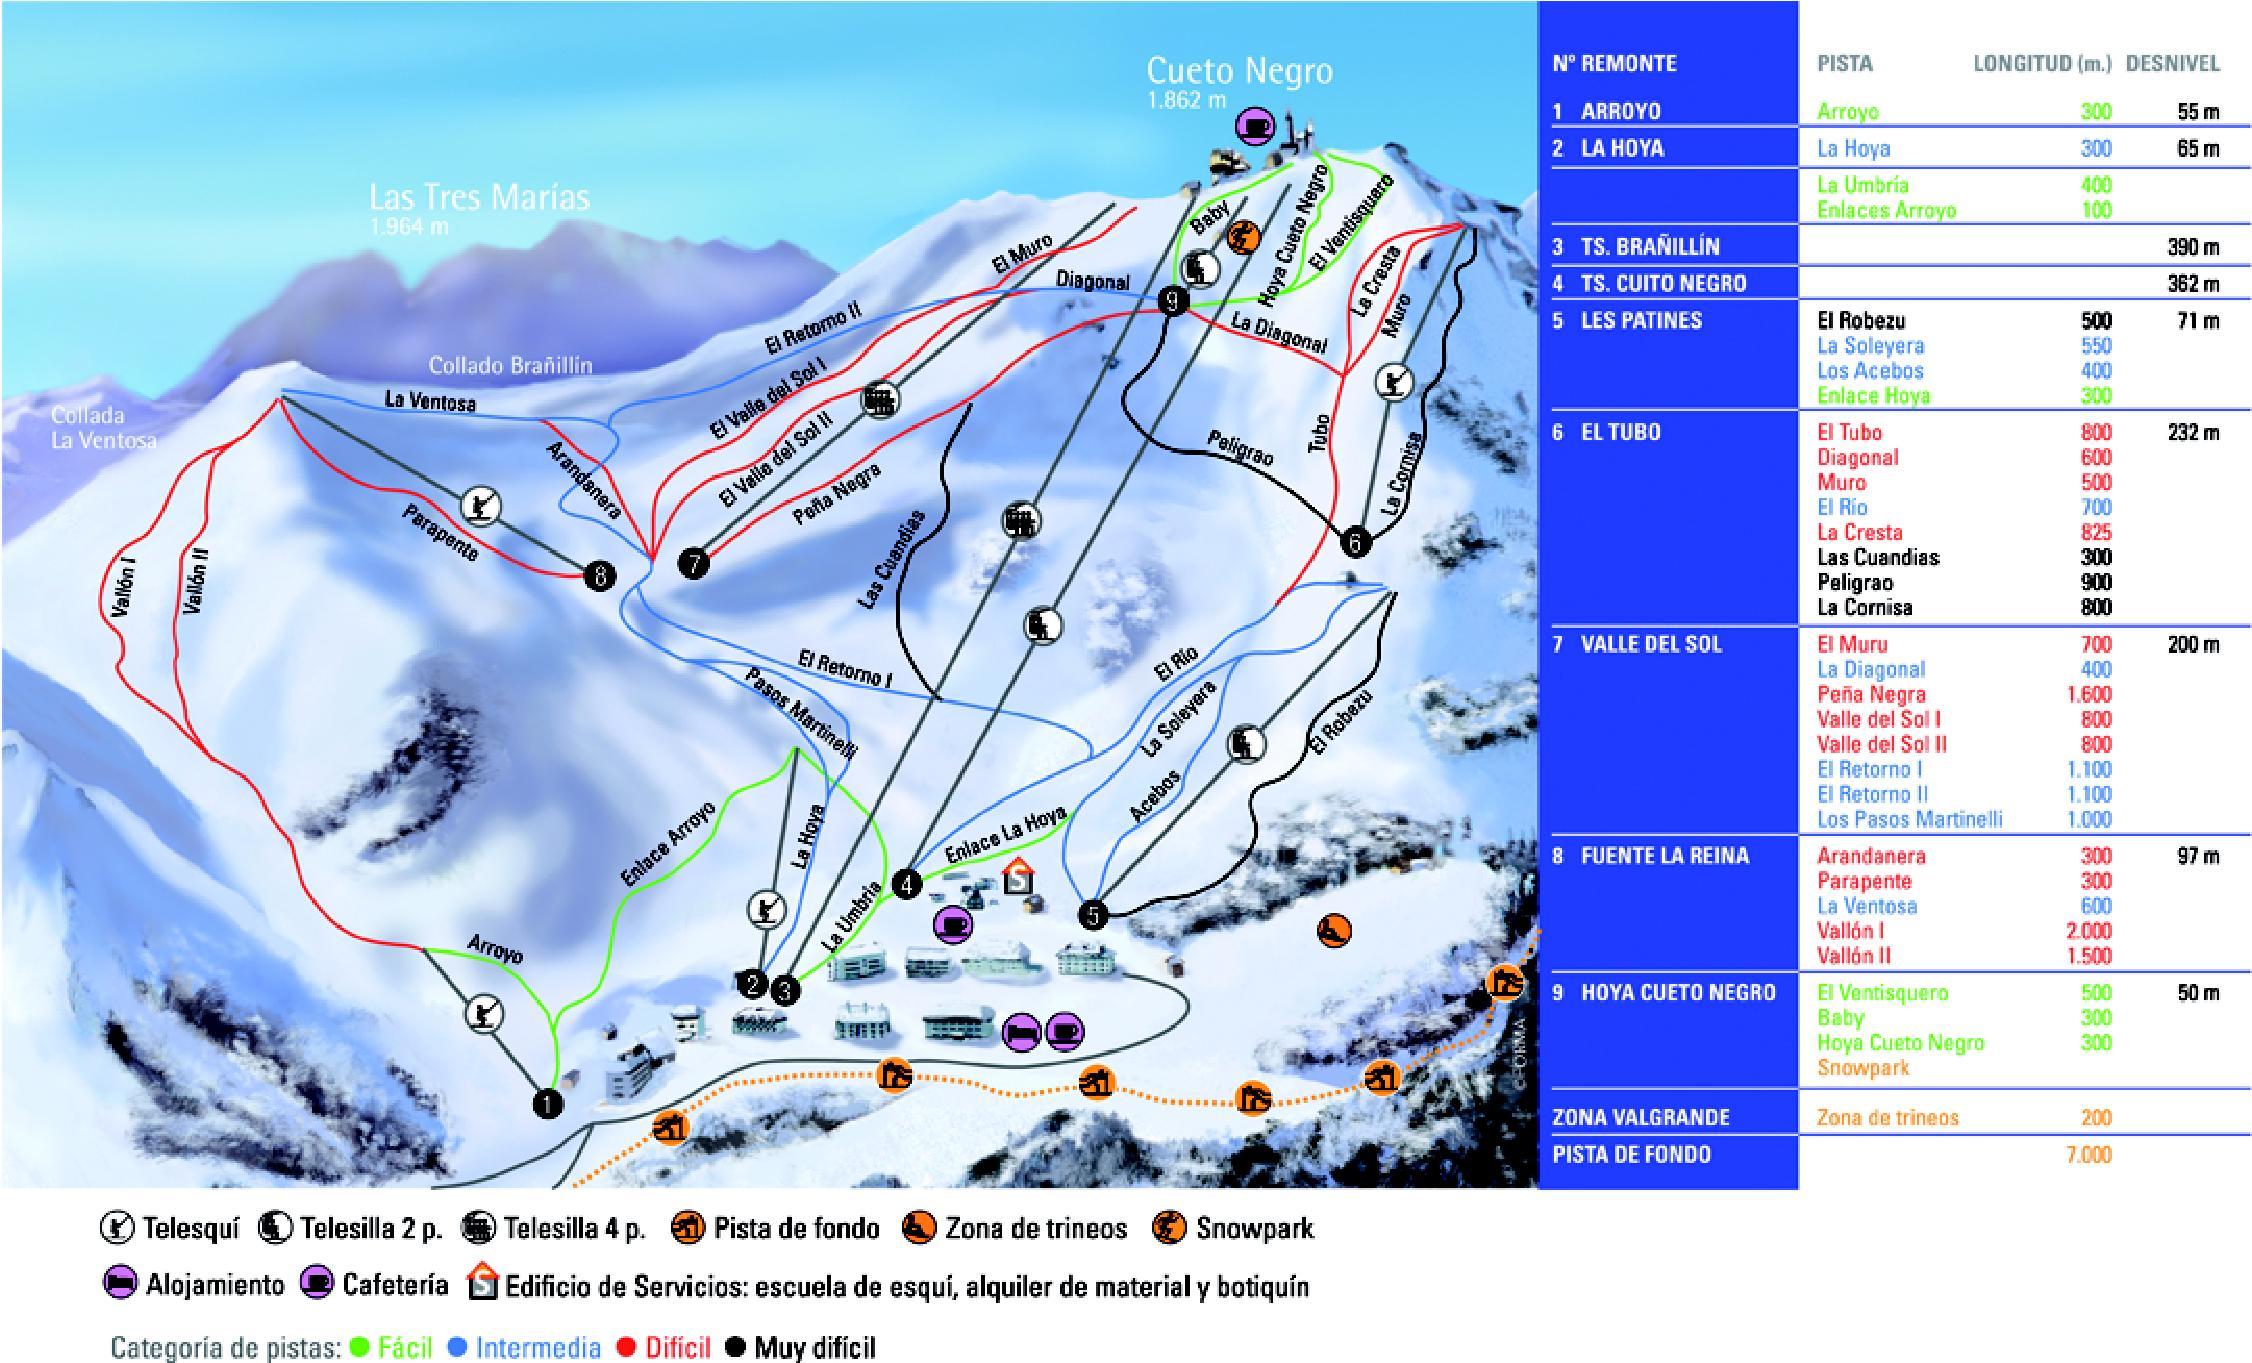 Valgrande-Pajares Trail map